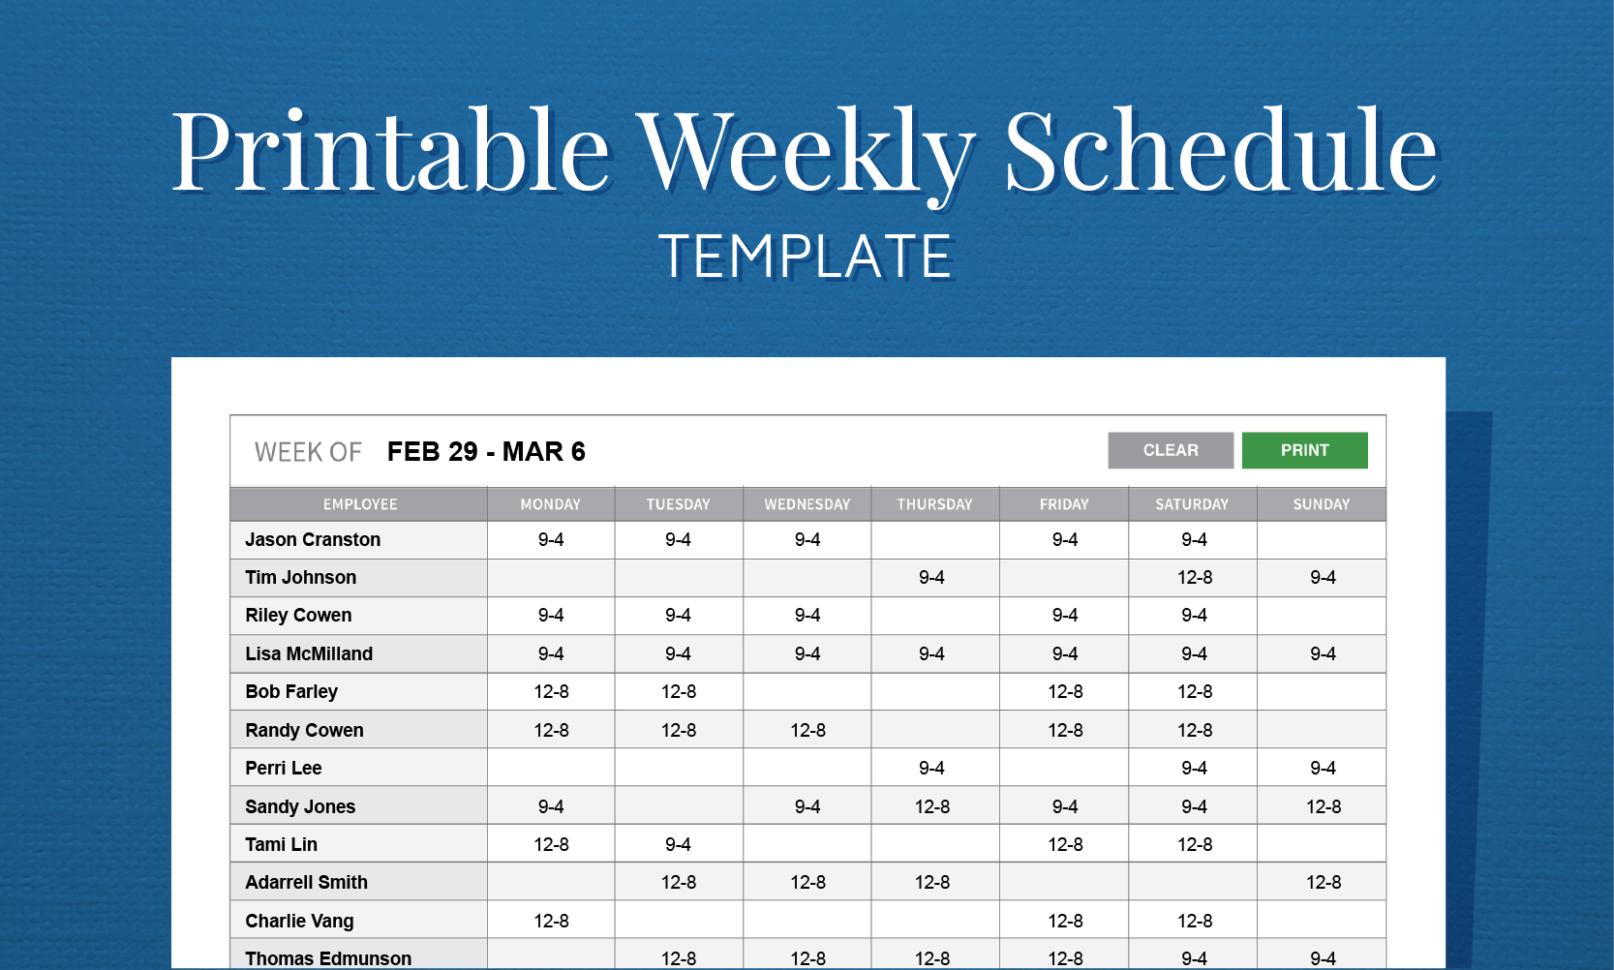 Free Printable Weekly Work Schedule Template For Employee Scheduling With Printable Employee Schedule Templates